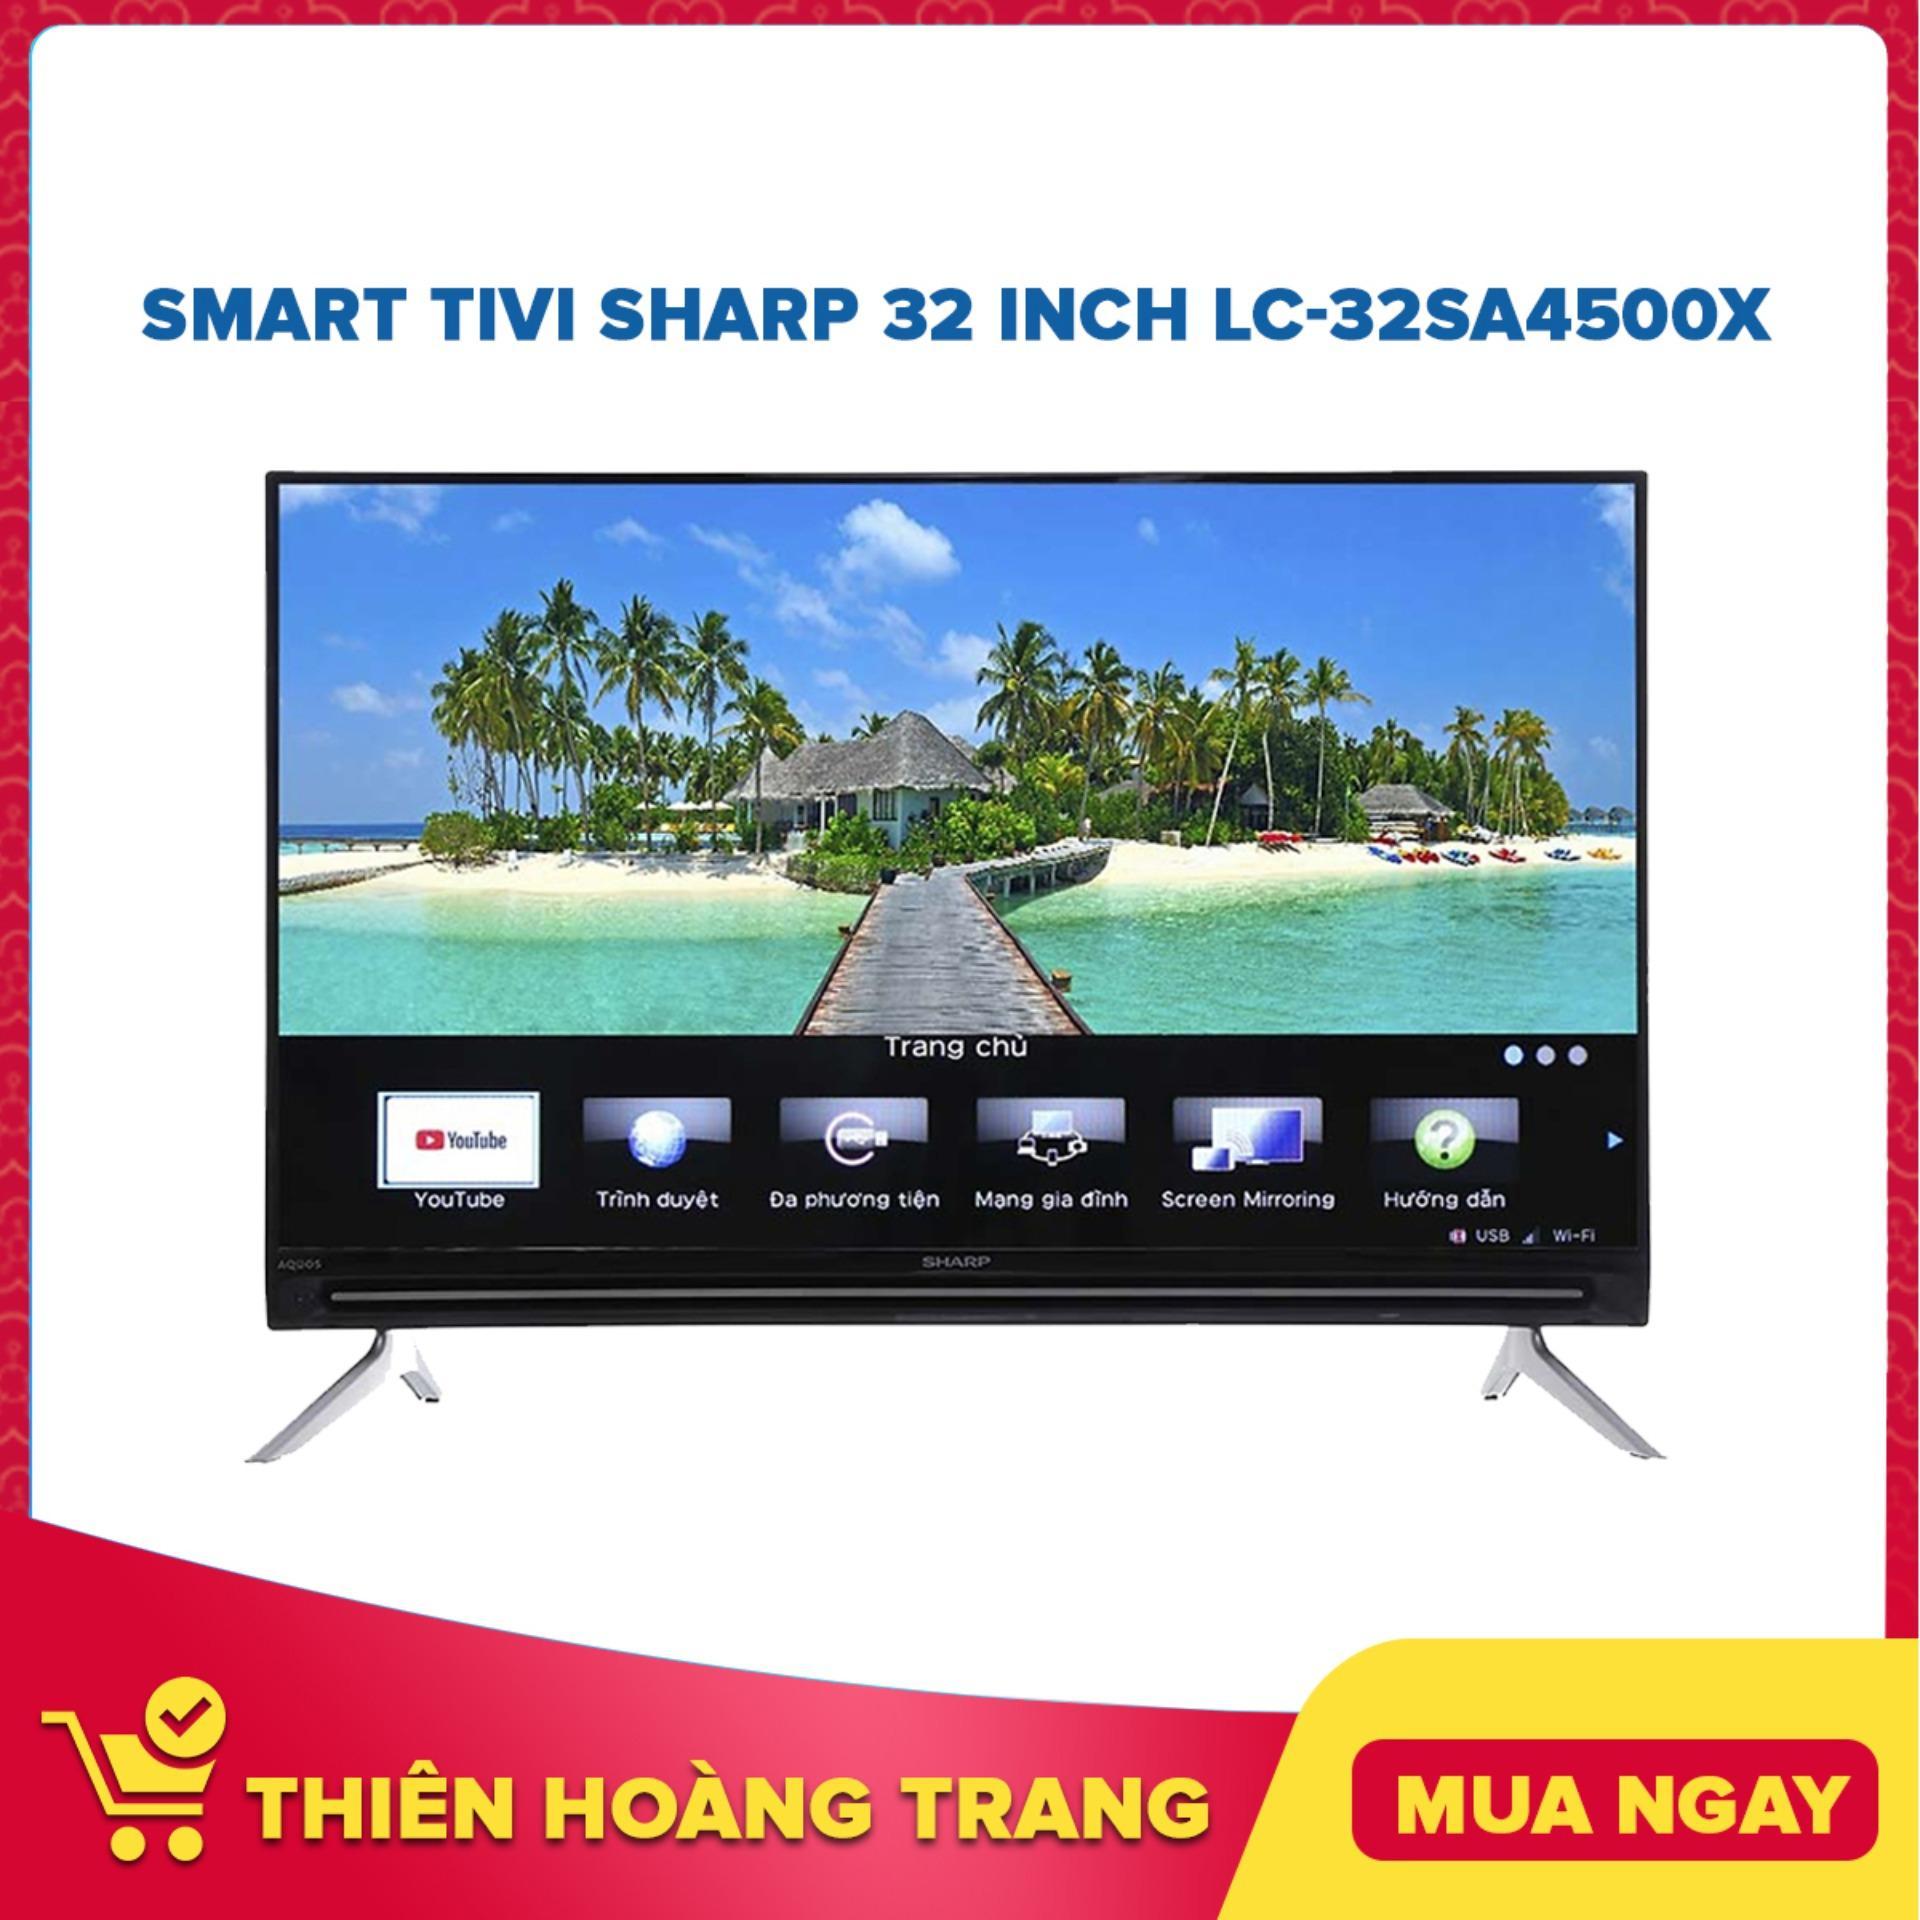 Smart Tivi Sharp 32 inch LC-32SA4500X